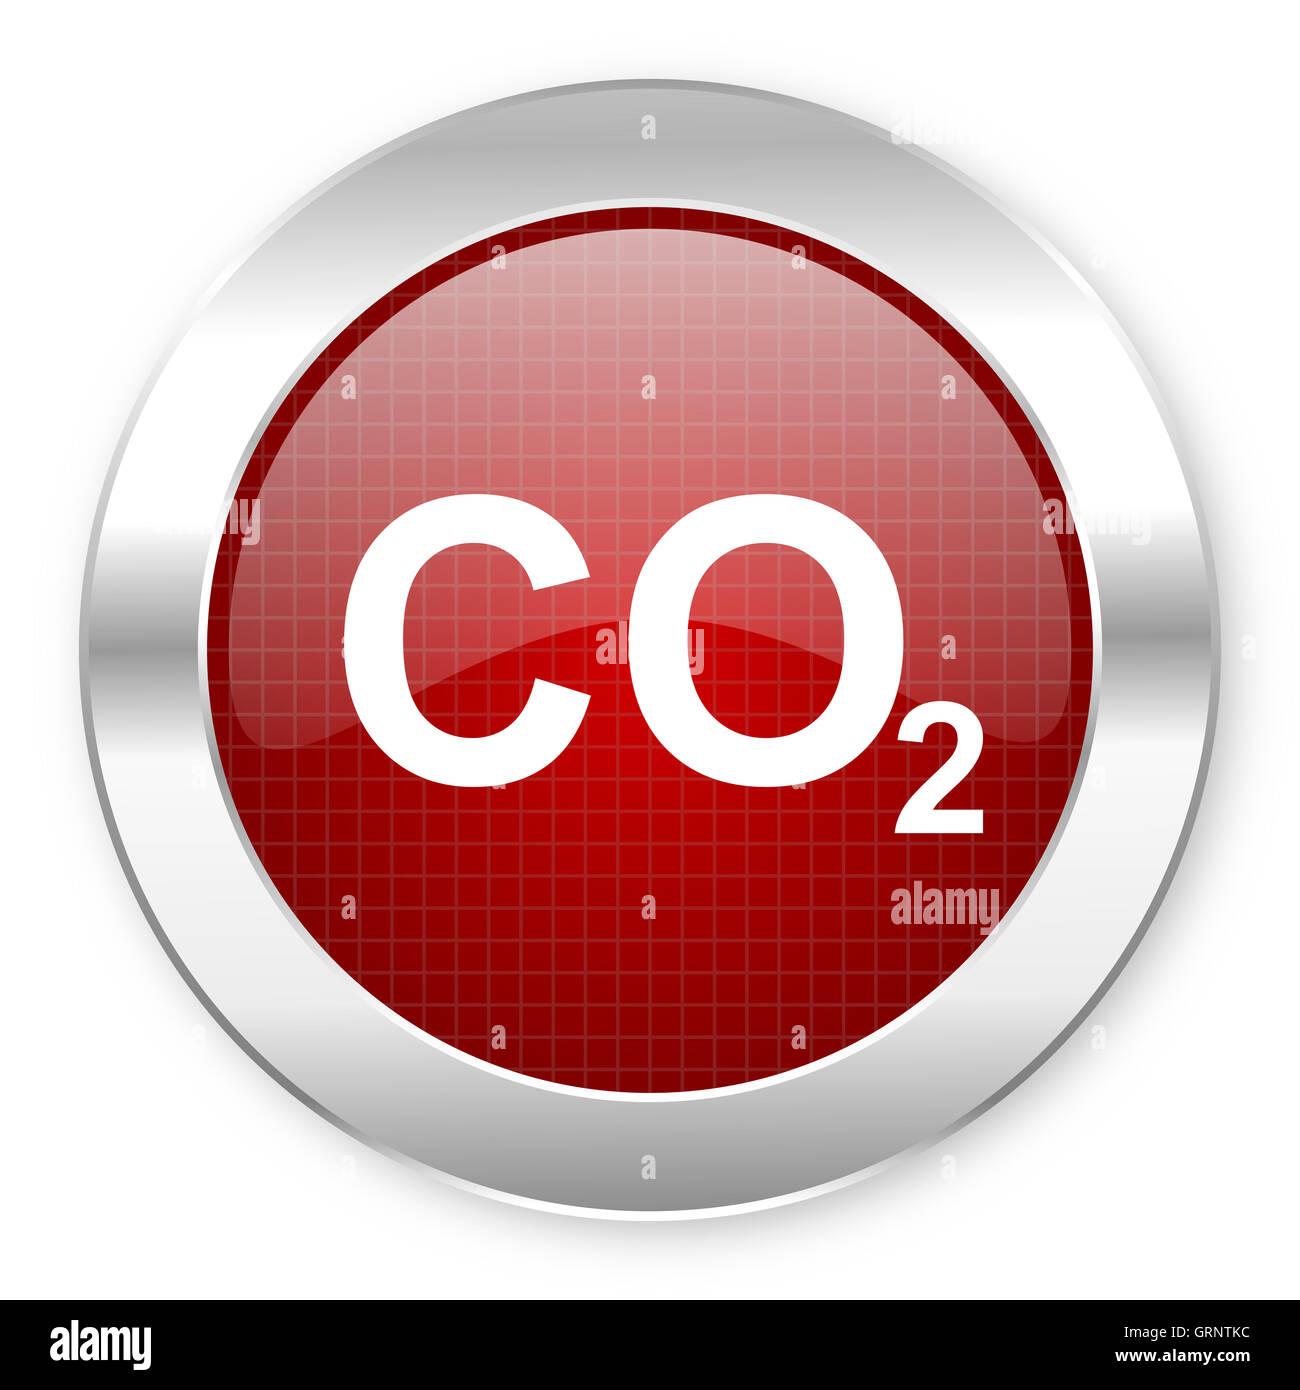 Carbon dioxide icon stock photo royalty free image 117879648 alamy carbon dioxide icon buycottarizona Images